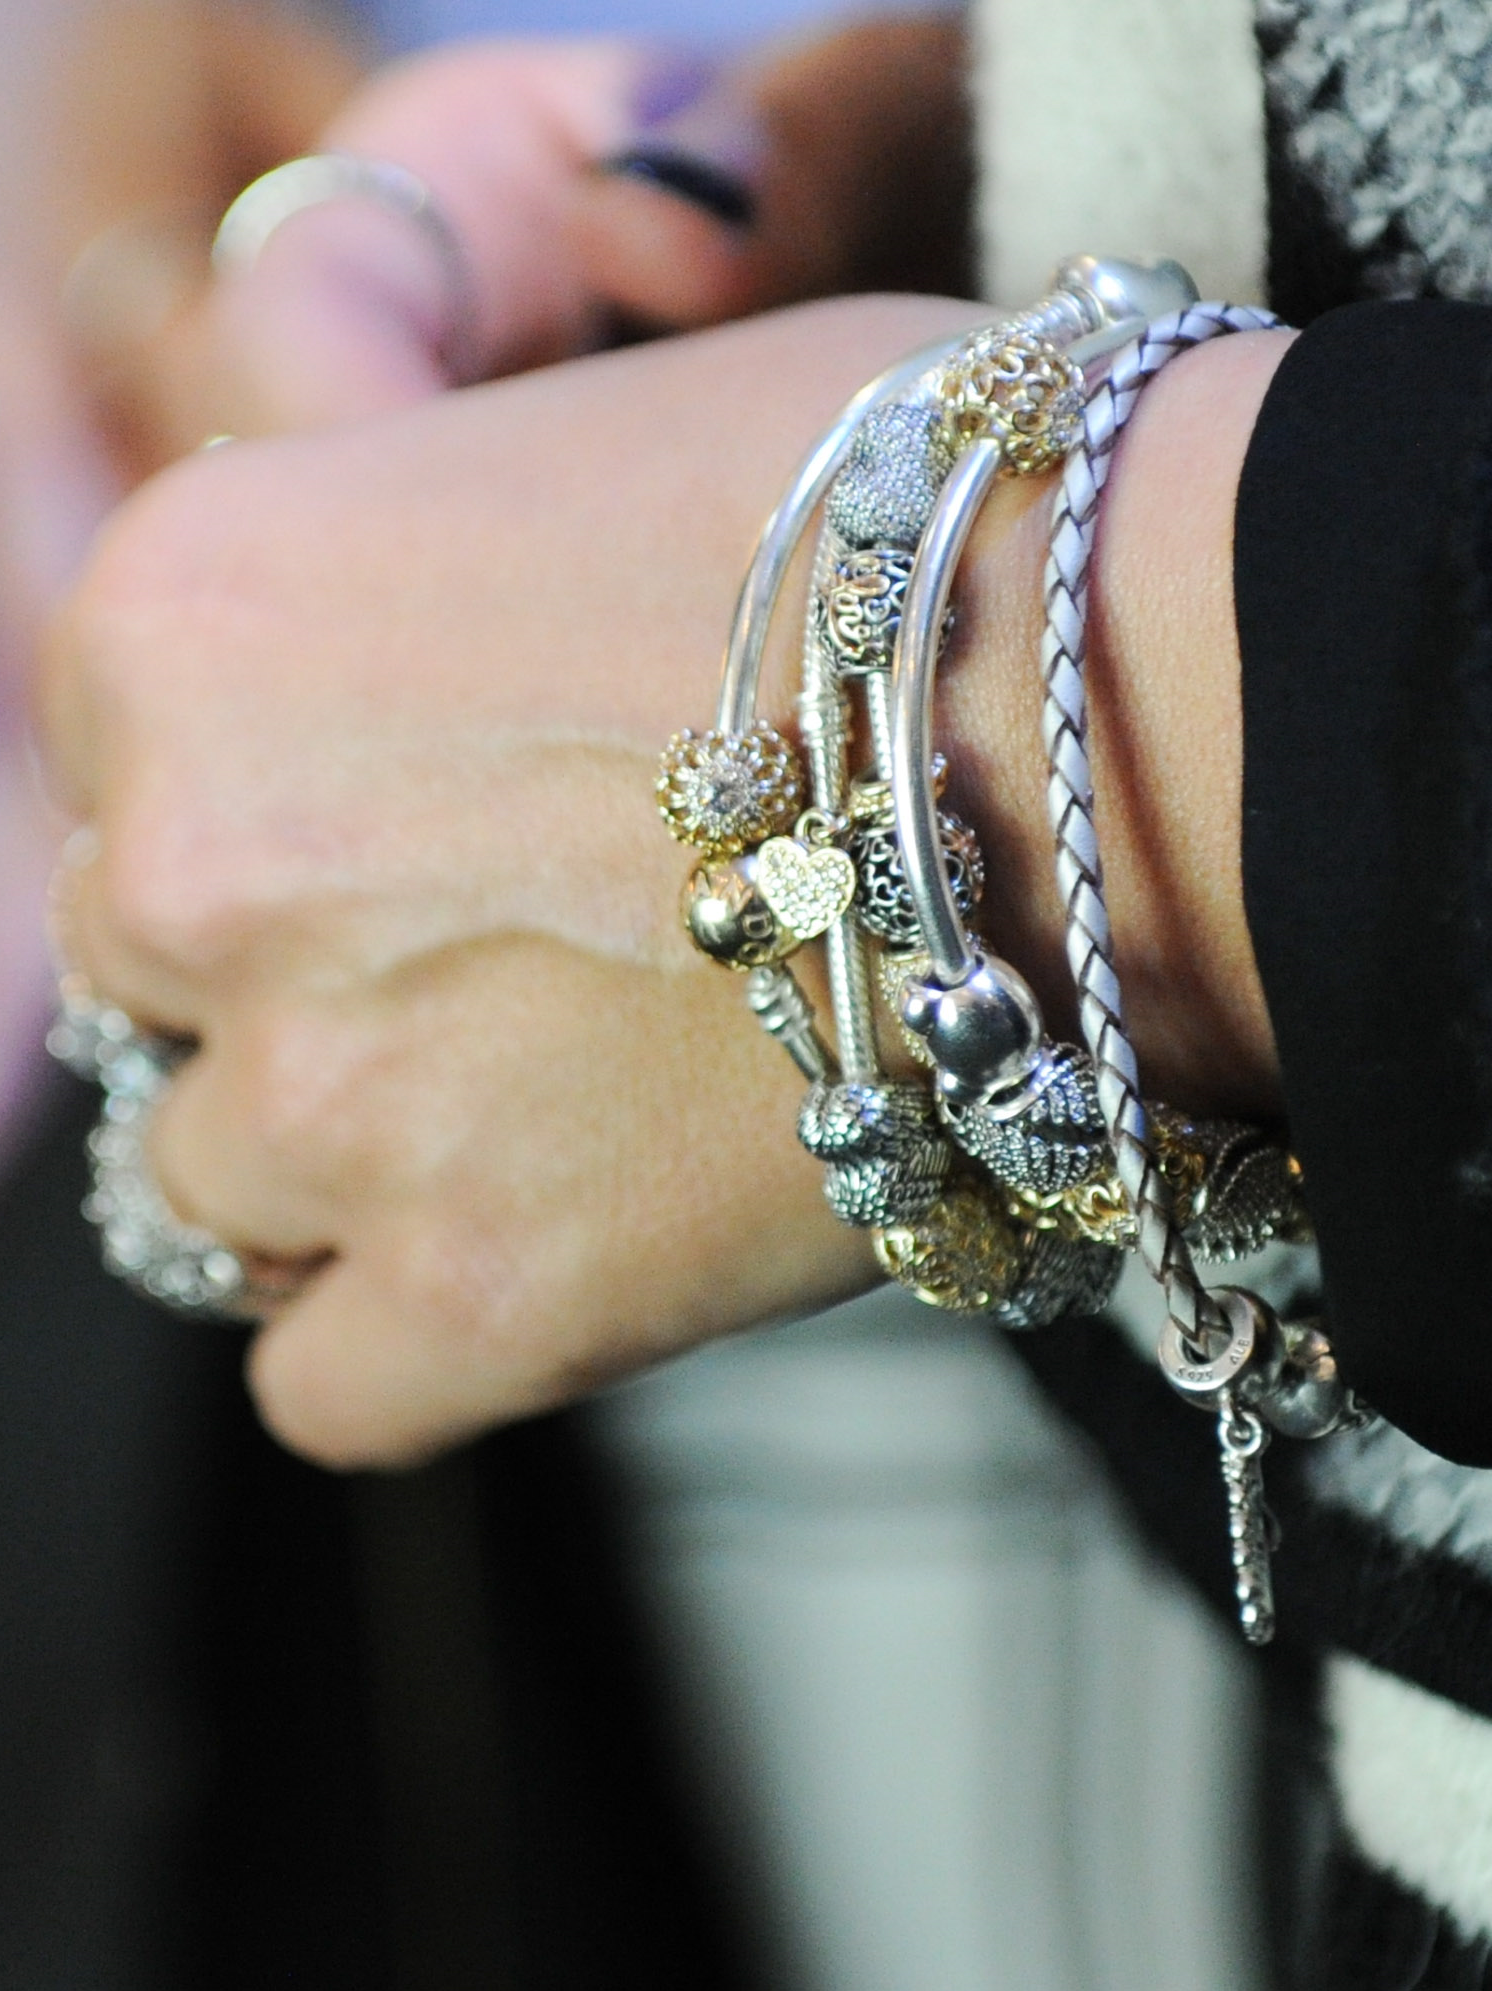 Closeup of janette ewenus amazing pandora bracelet stack